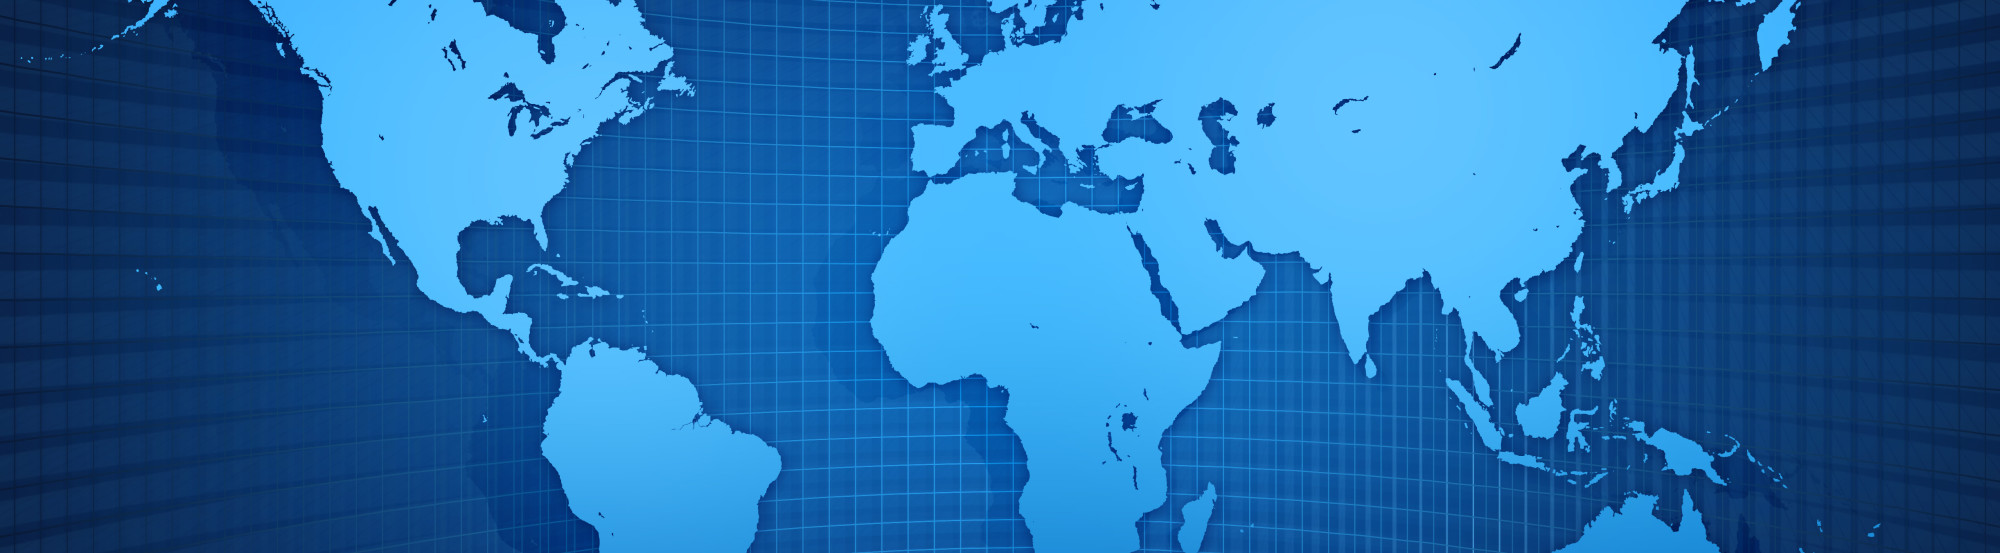 world-map-background1